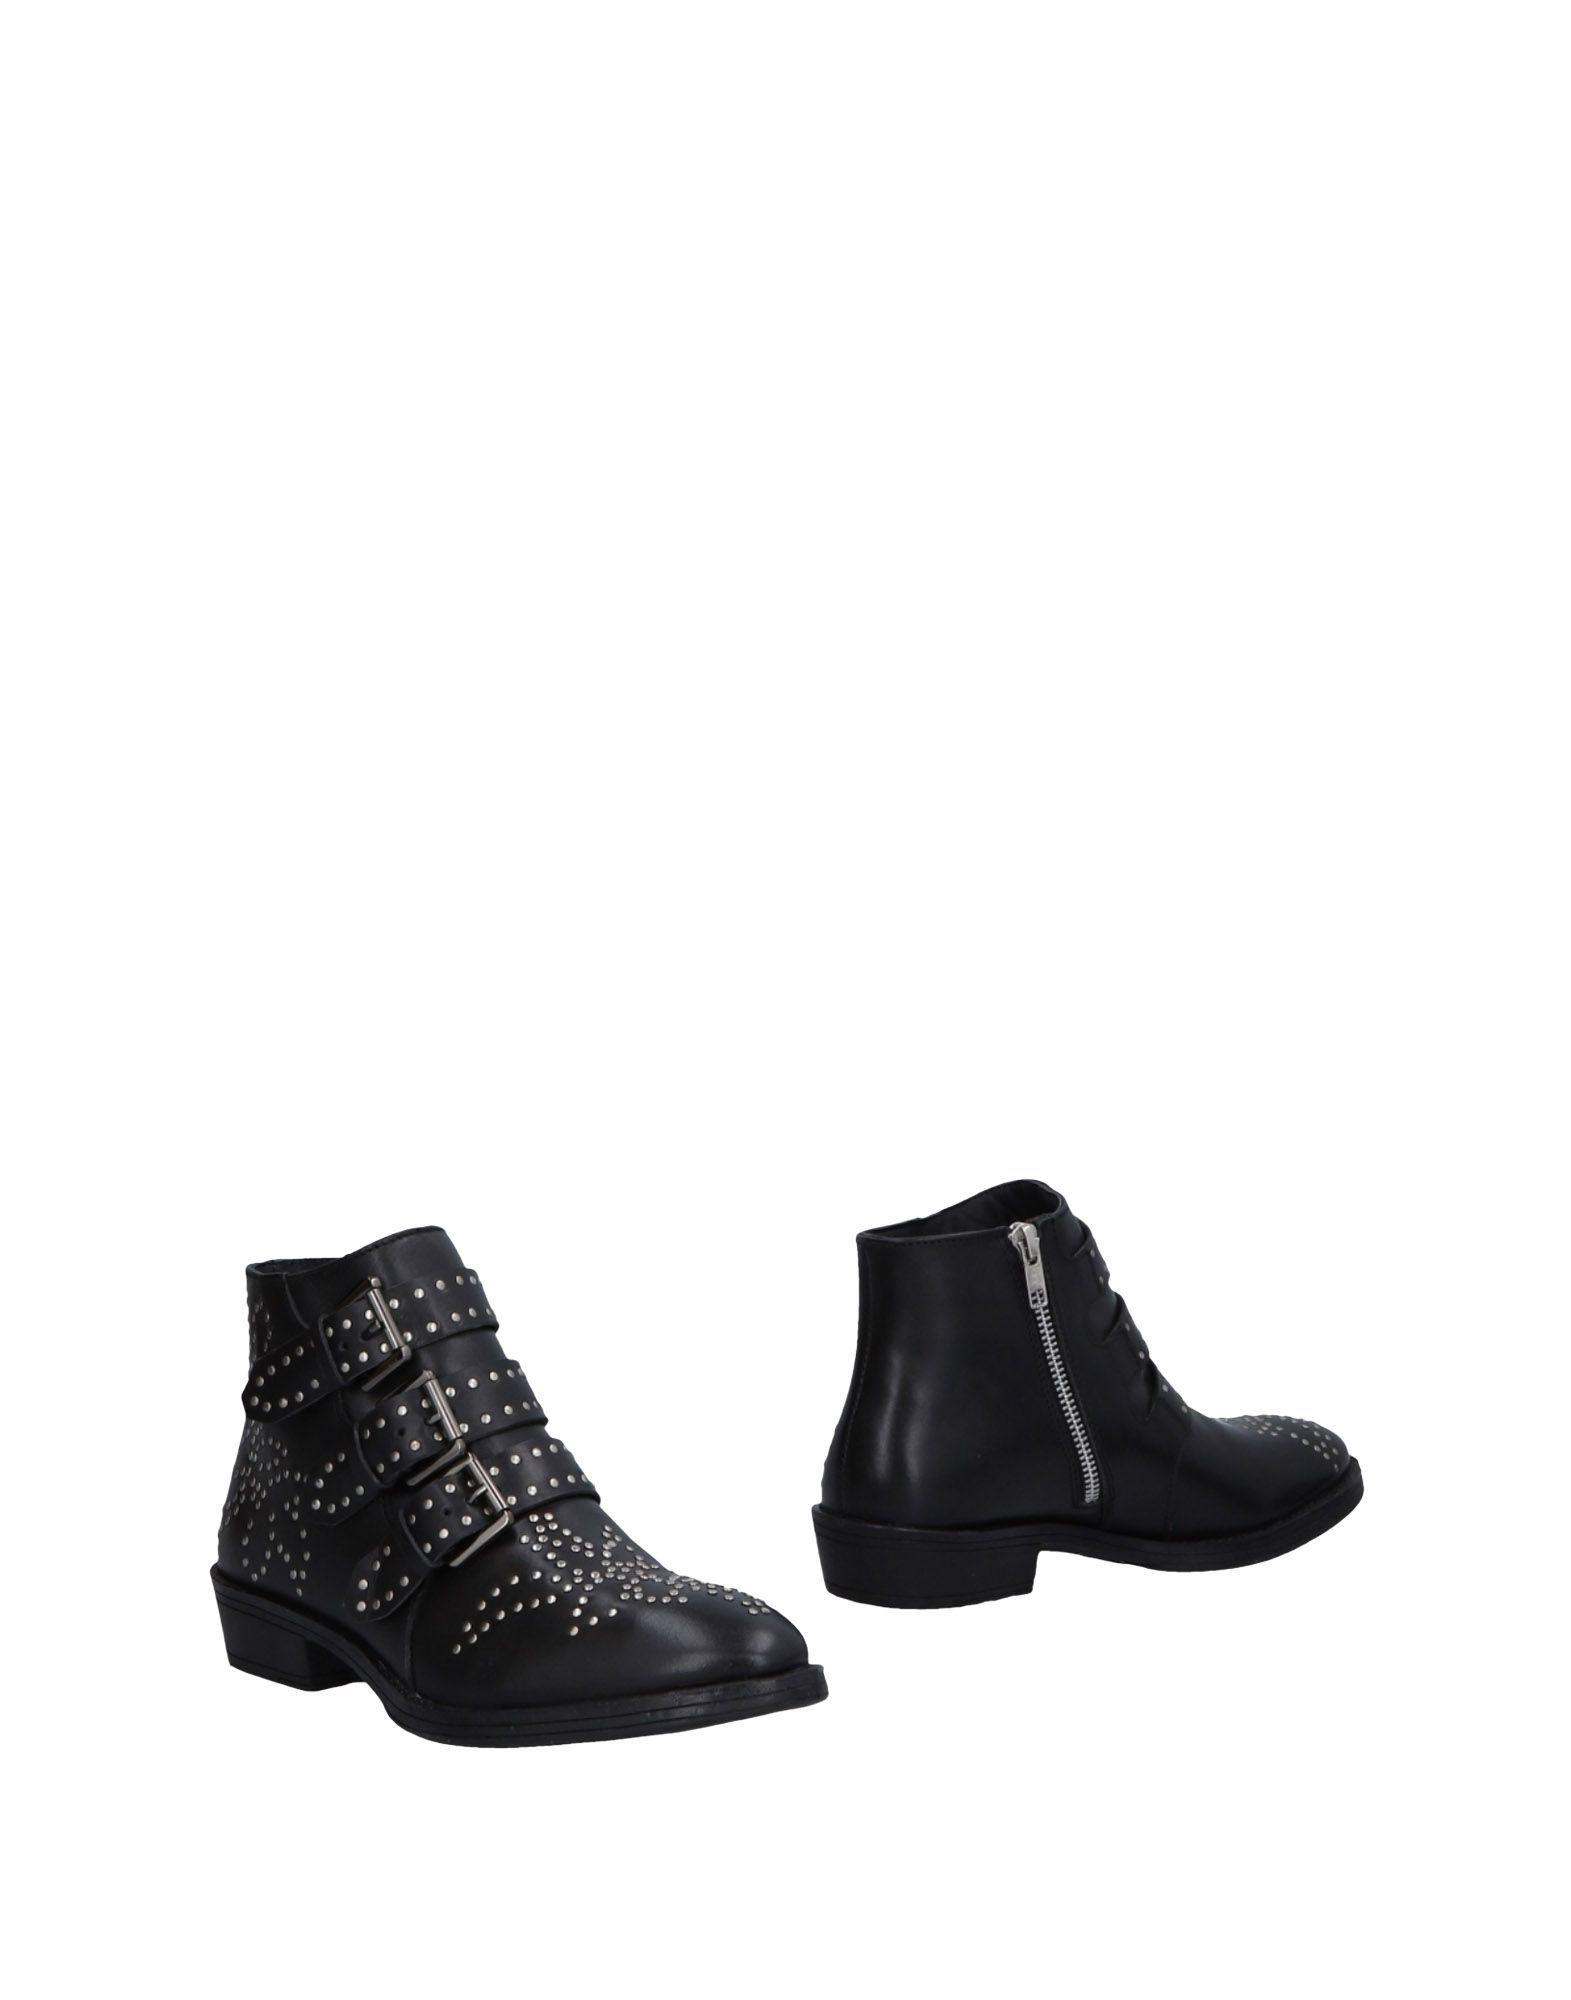 Footwear Nila & Nila Black Women's Leather